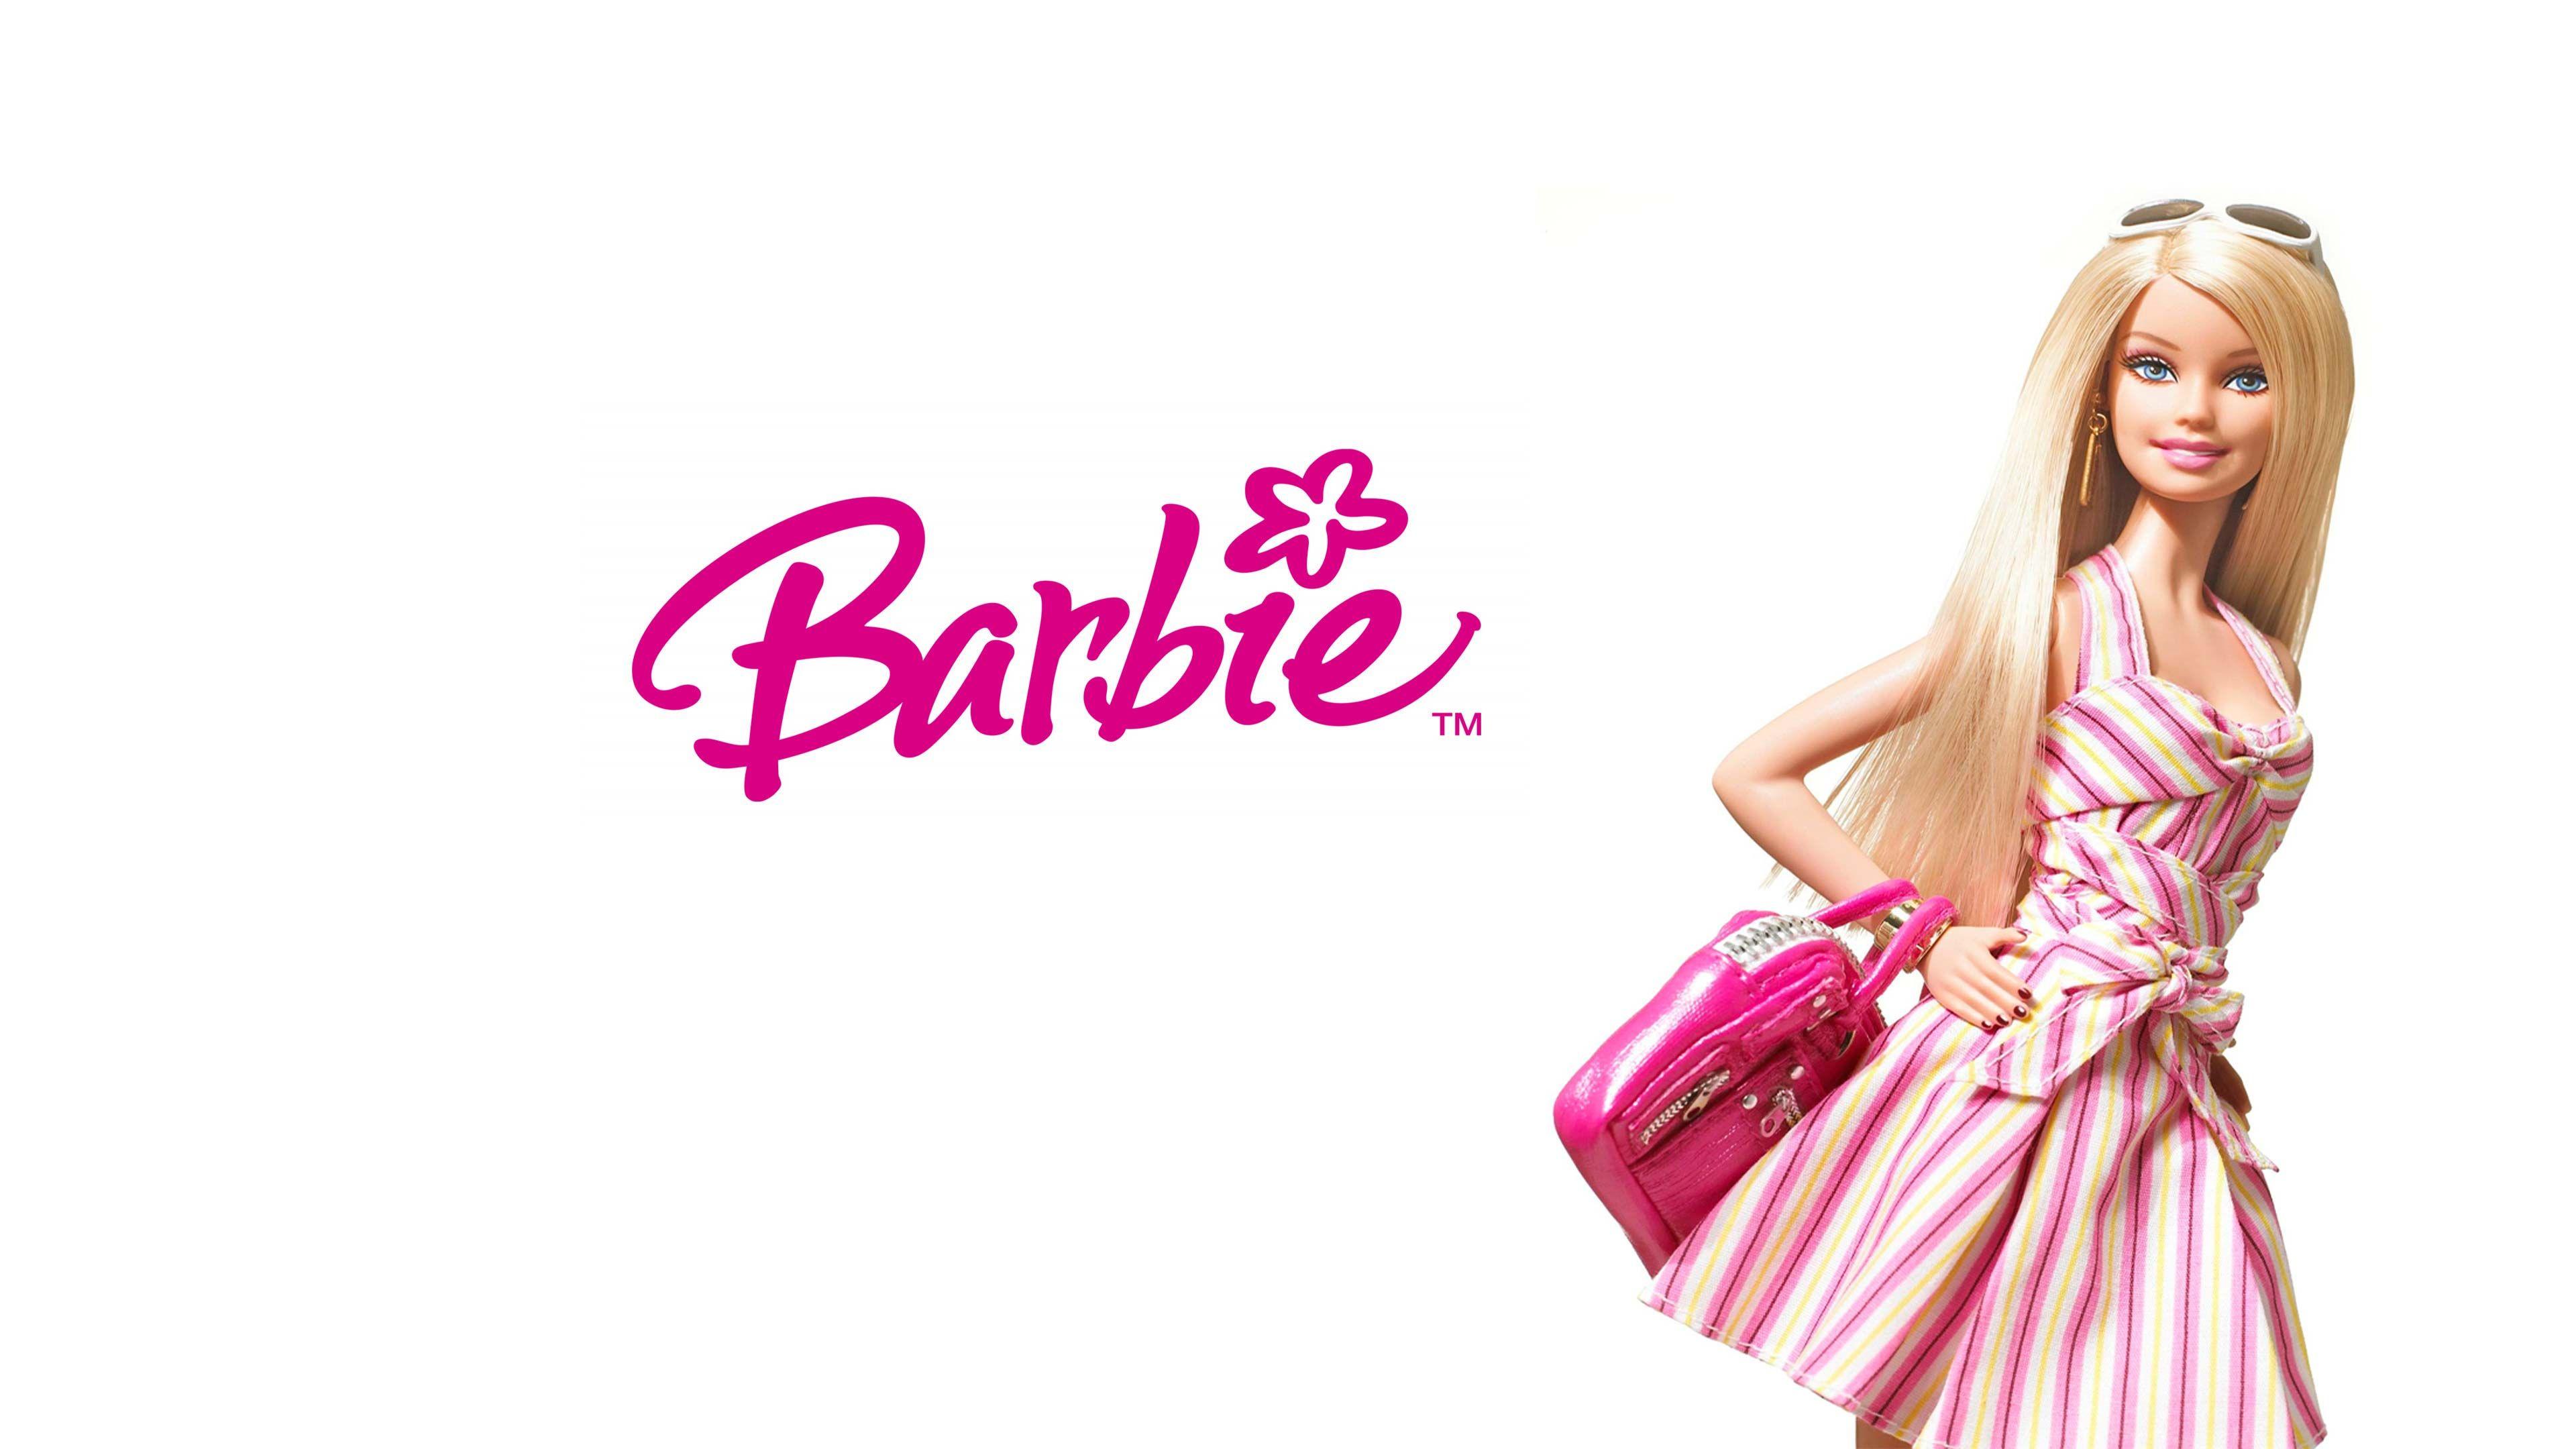 Barbie Barbie Images Barbie Barbie Dolls